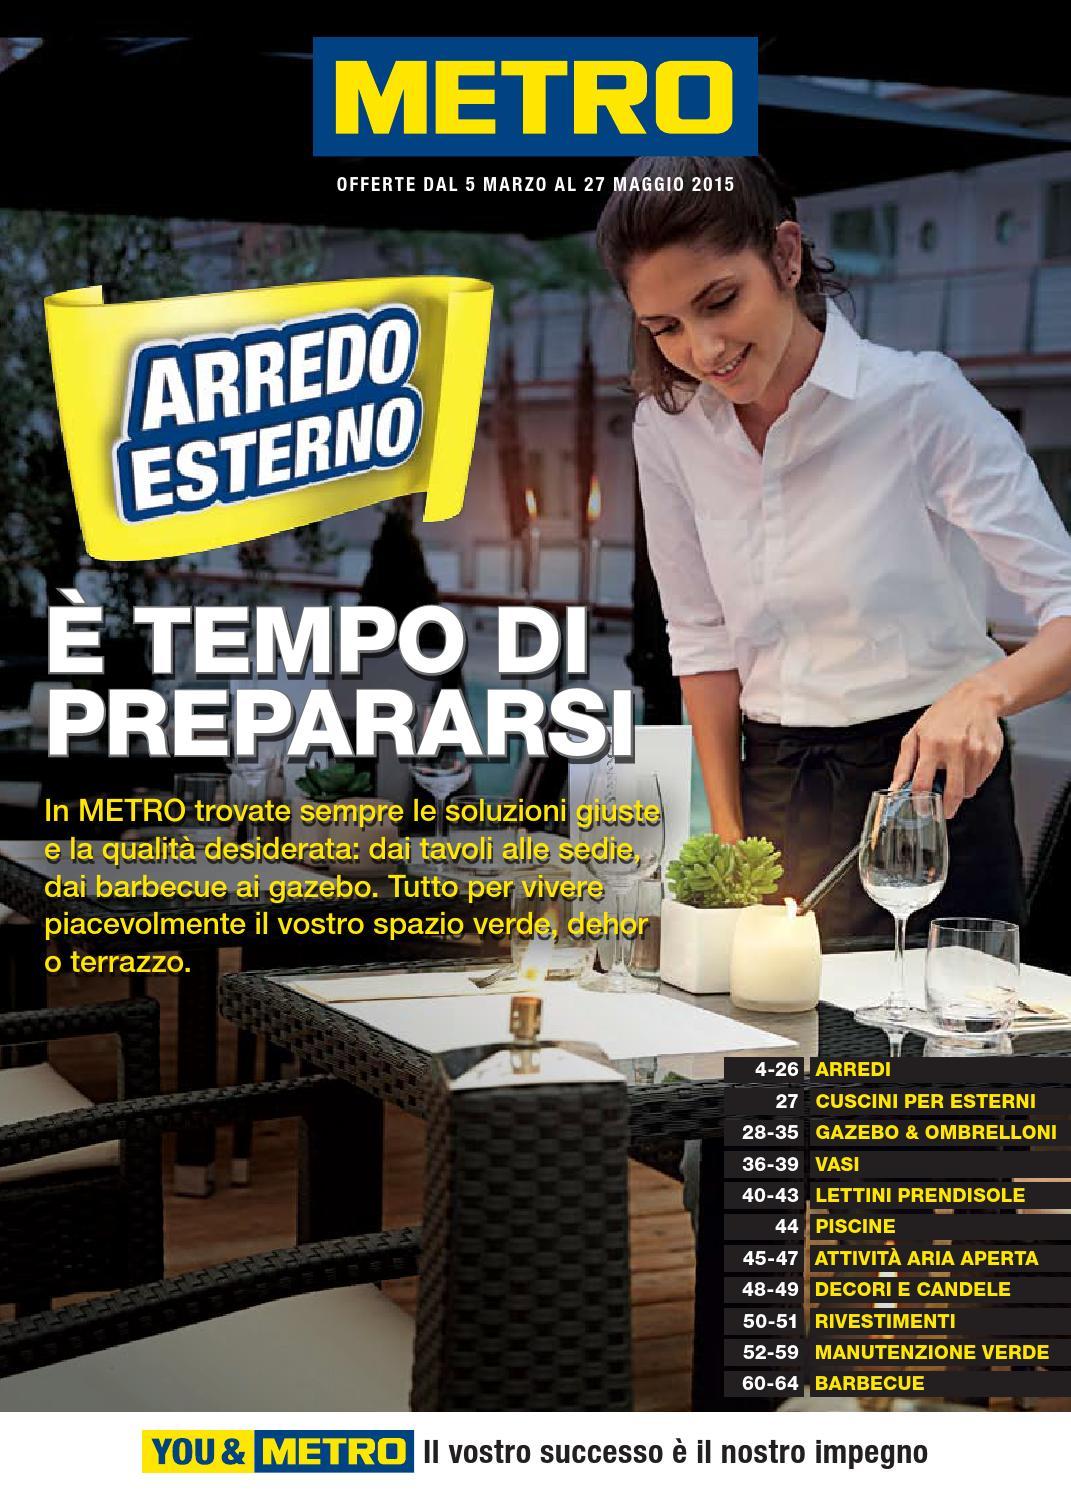 Metro italia arredo esterno 3 by masura issuu for Italia arredo